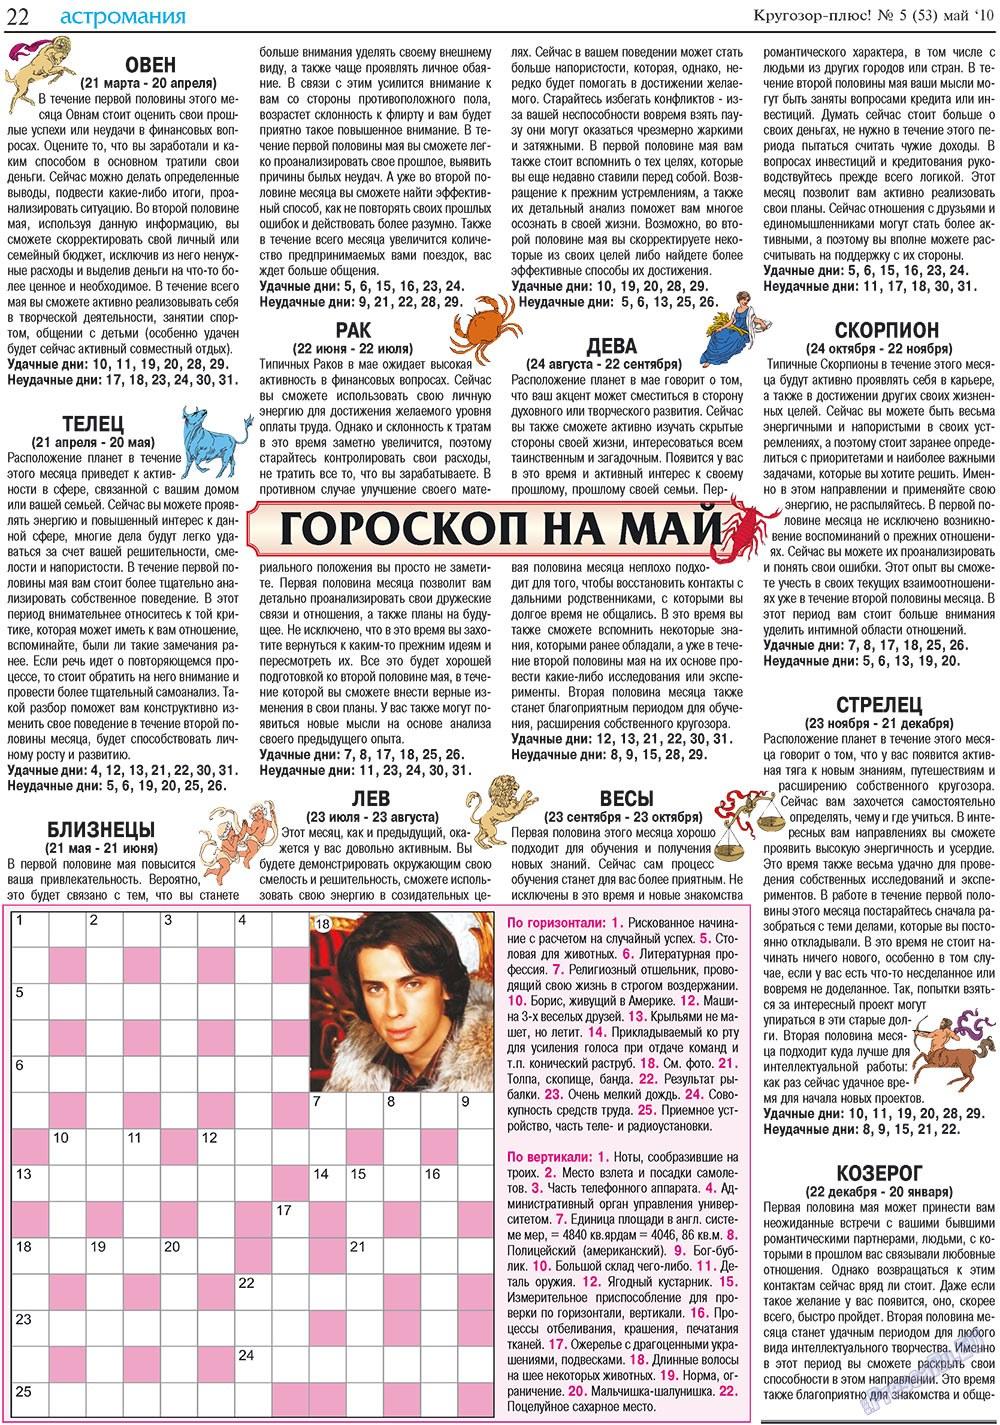 Кругозор плюс! (газета). 2010 год, номер 5, стр. 38